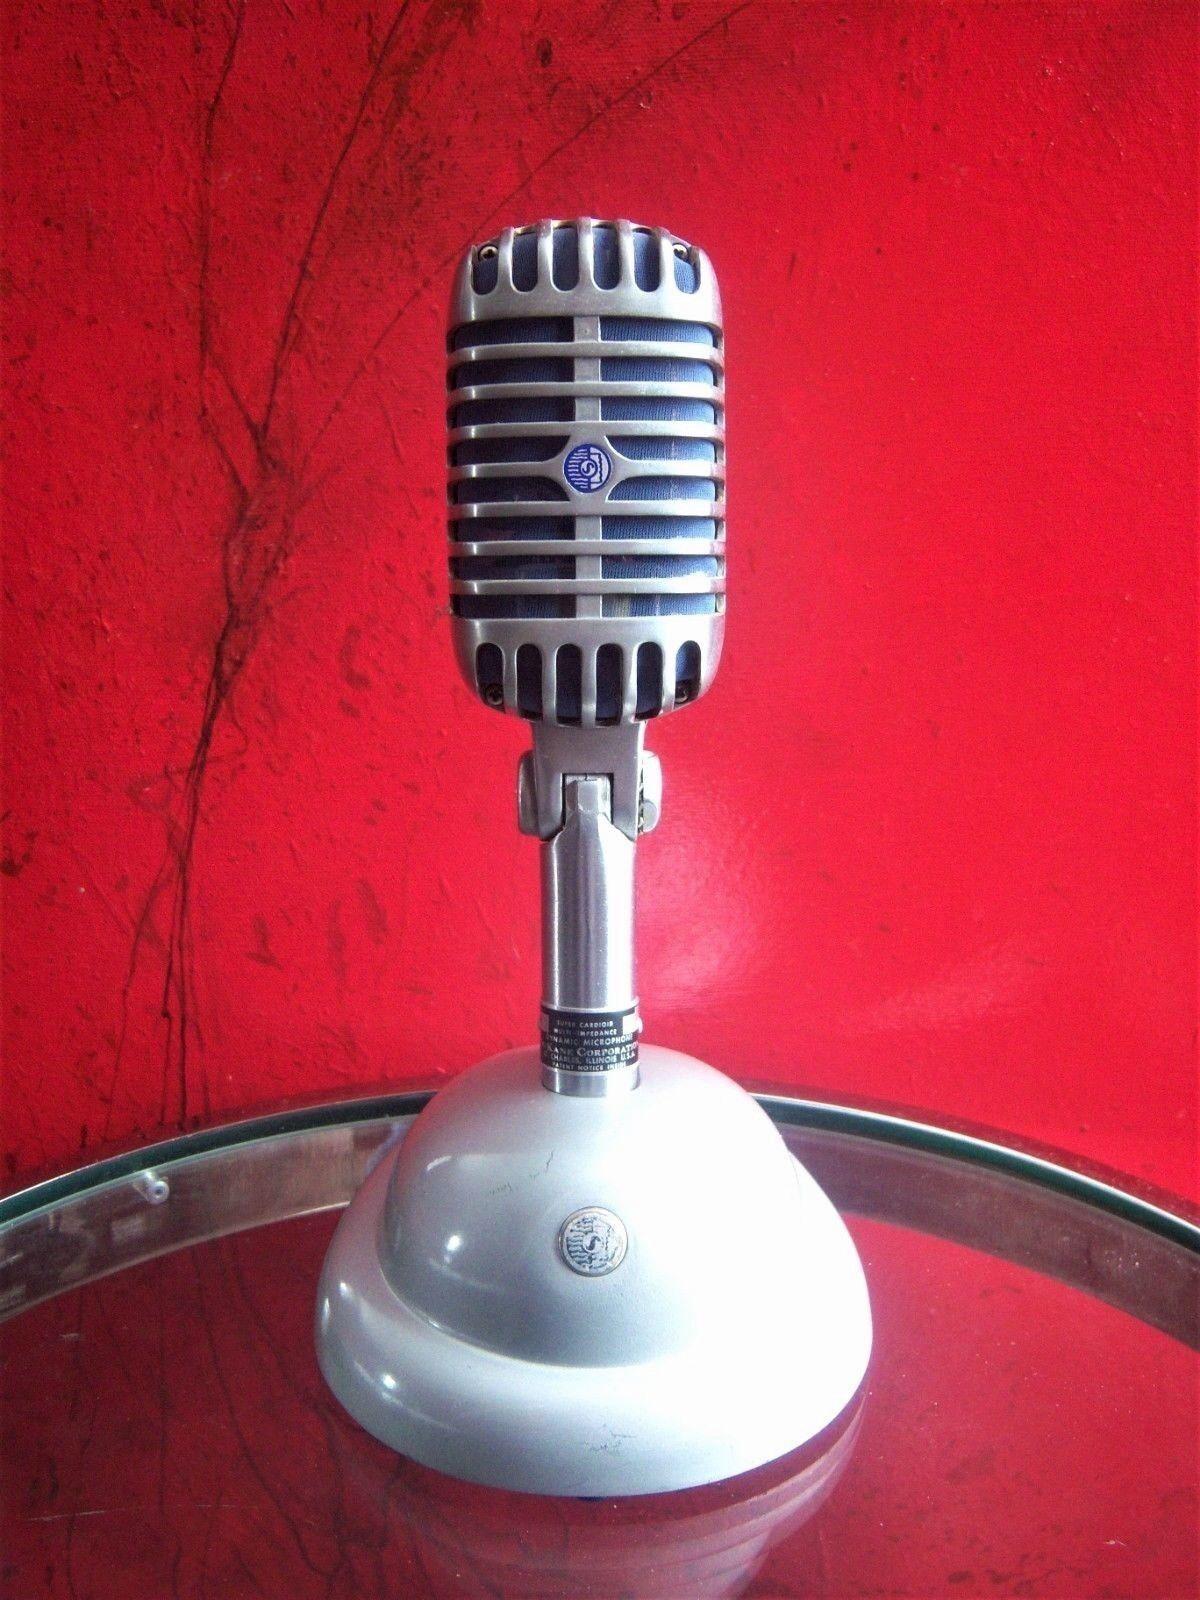 Vintage Raro 1959 Dukane Dukane Dukane 7A65 micrófono dinámico SHURE Brojohers 55 S W Stand  40% de descuento